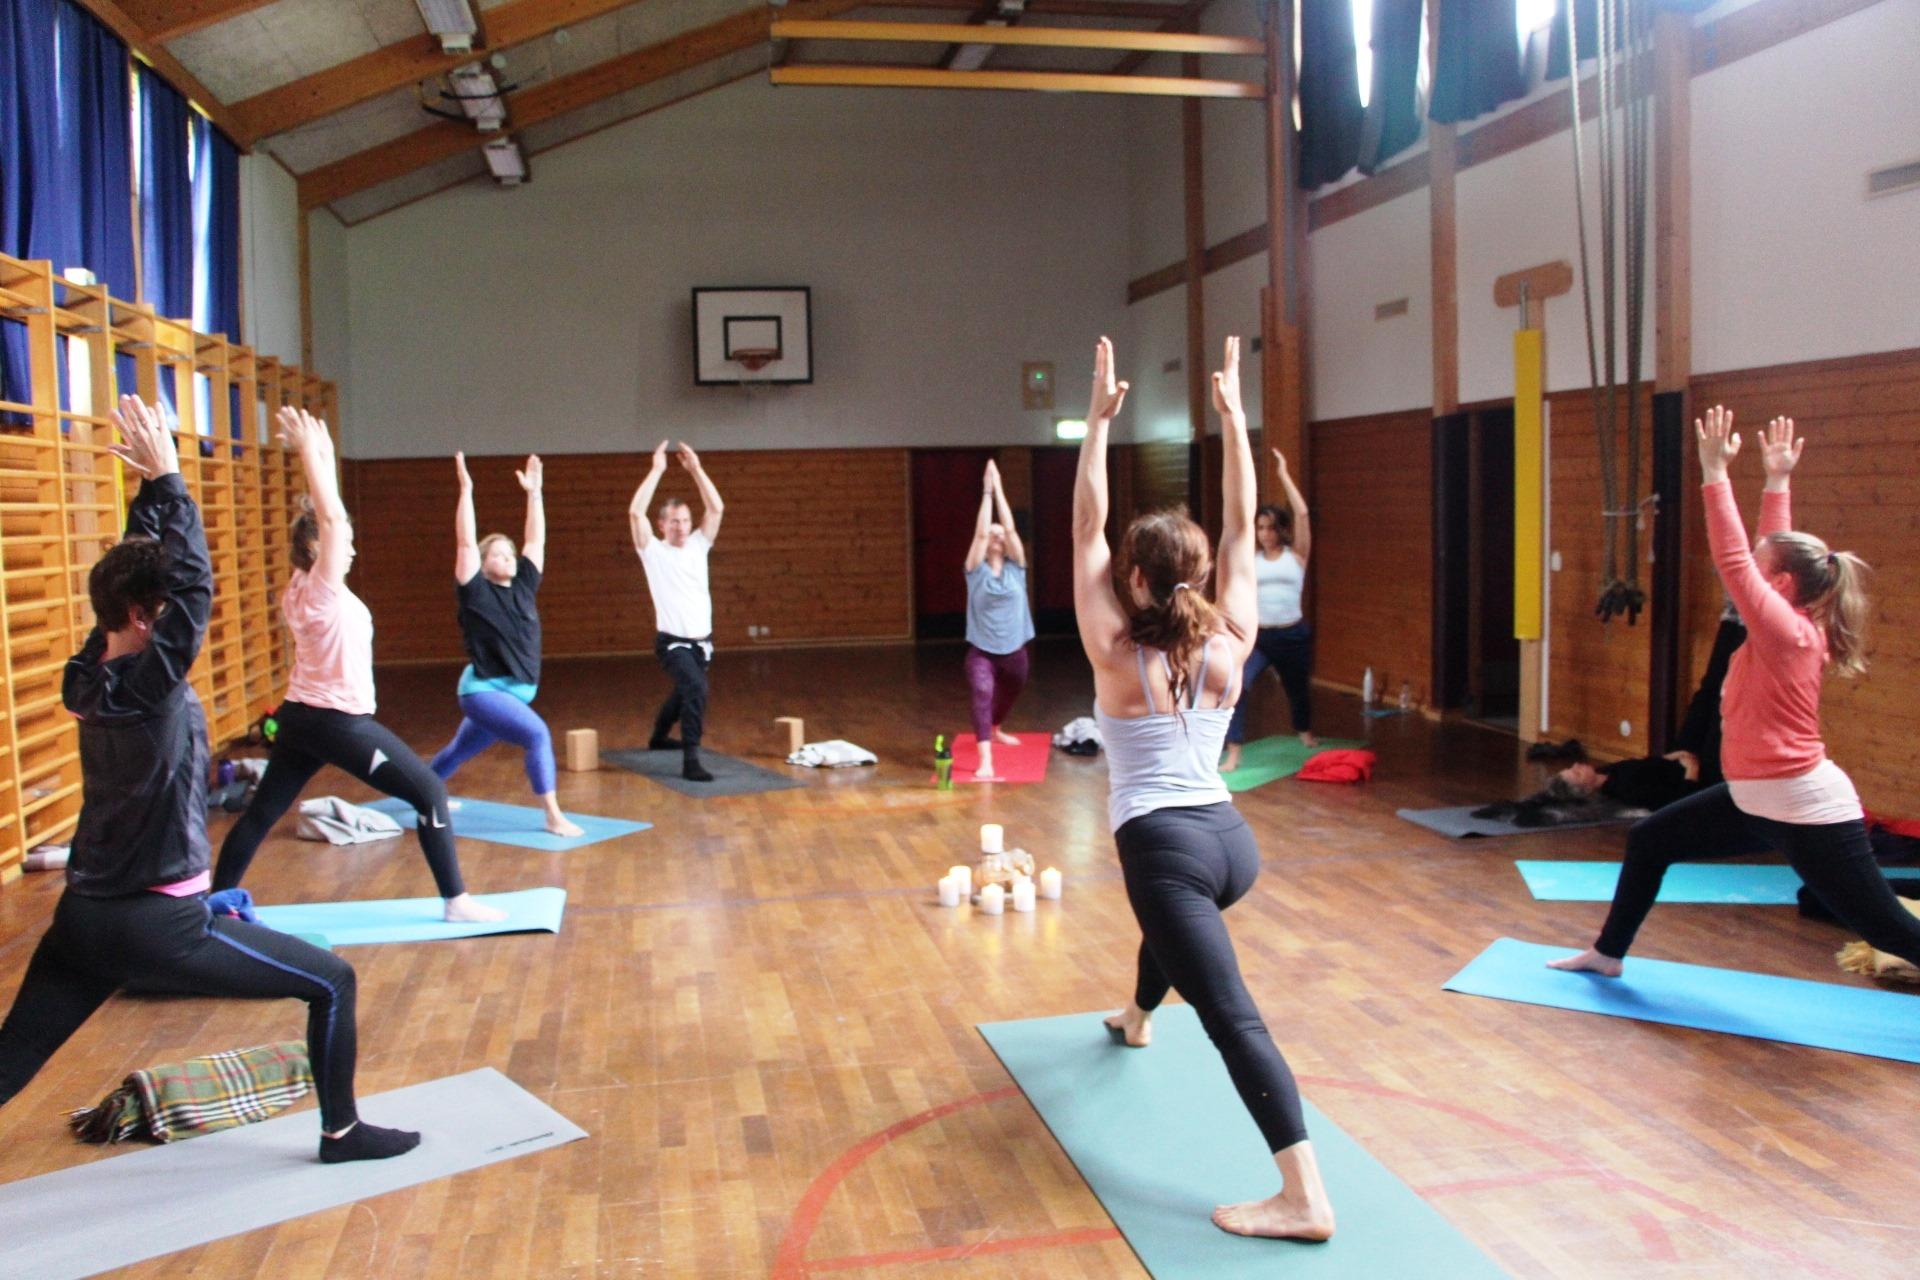 Yogahelg, yoga bergen, yoga signe, signe yoga, yogaweekend, yoga retreat norge, Åkrafjorden, yoga og hest, visit Sunnhordland, yoga utendørs, yoga outside, fjellyoga, yoga ved fjorden, utno,